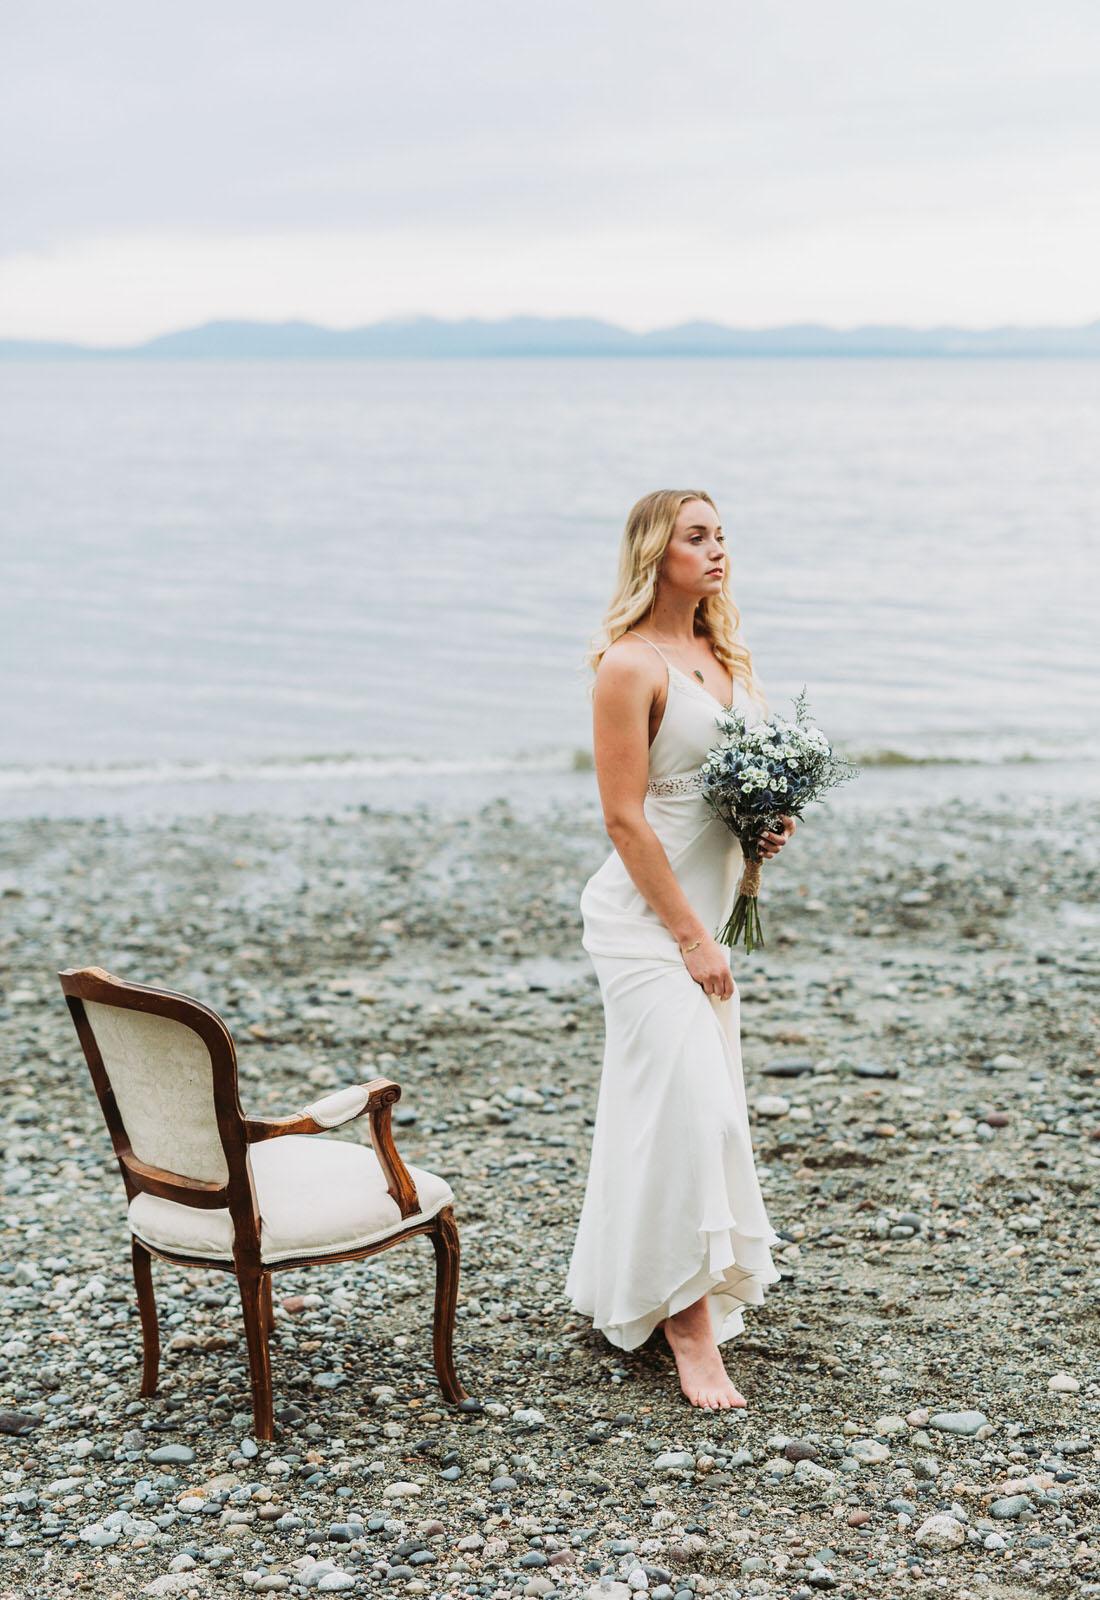 Jennifer Picard Photography - Vancouver Wedding Photographer - Sunshine Coast Wedding Photographer - Bridal InspirationIMG_8915.jpg